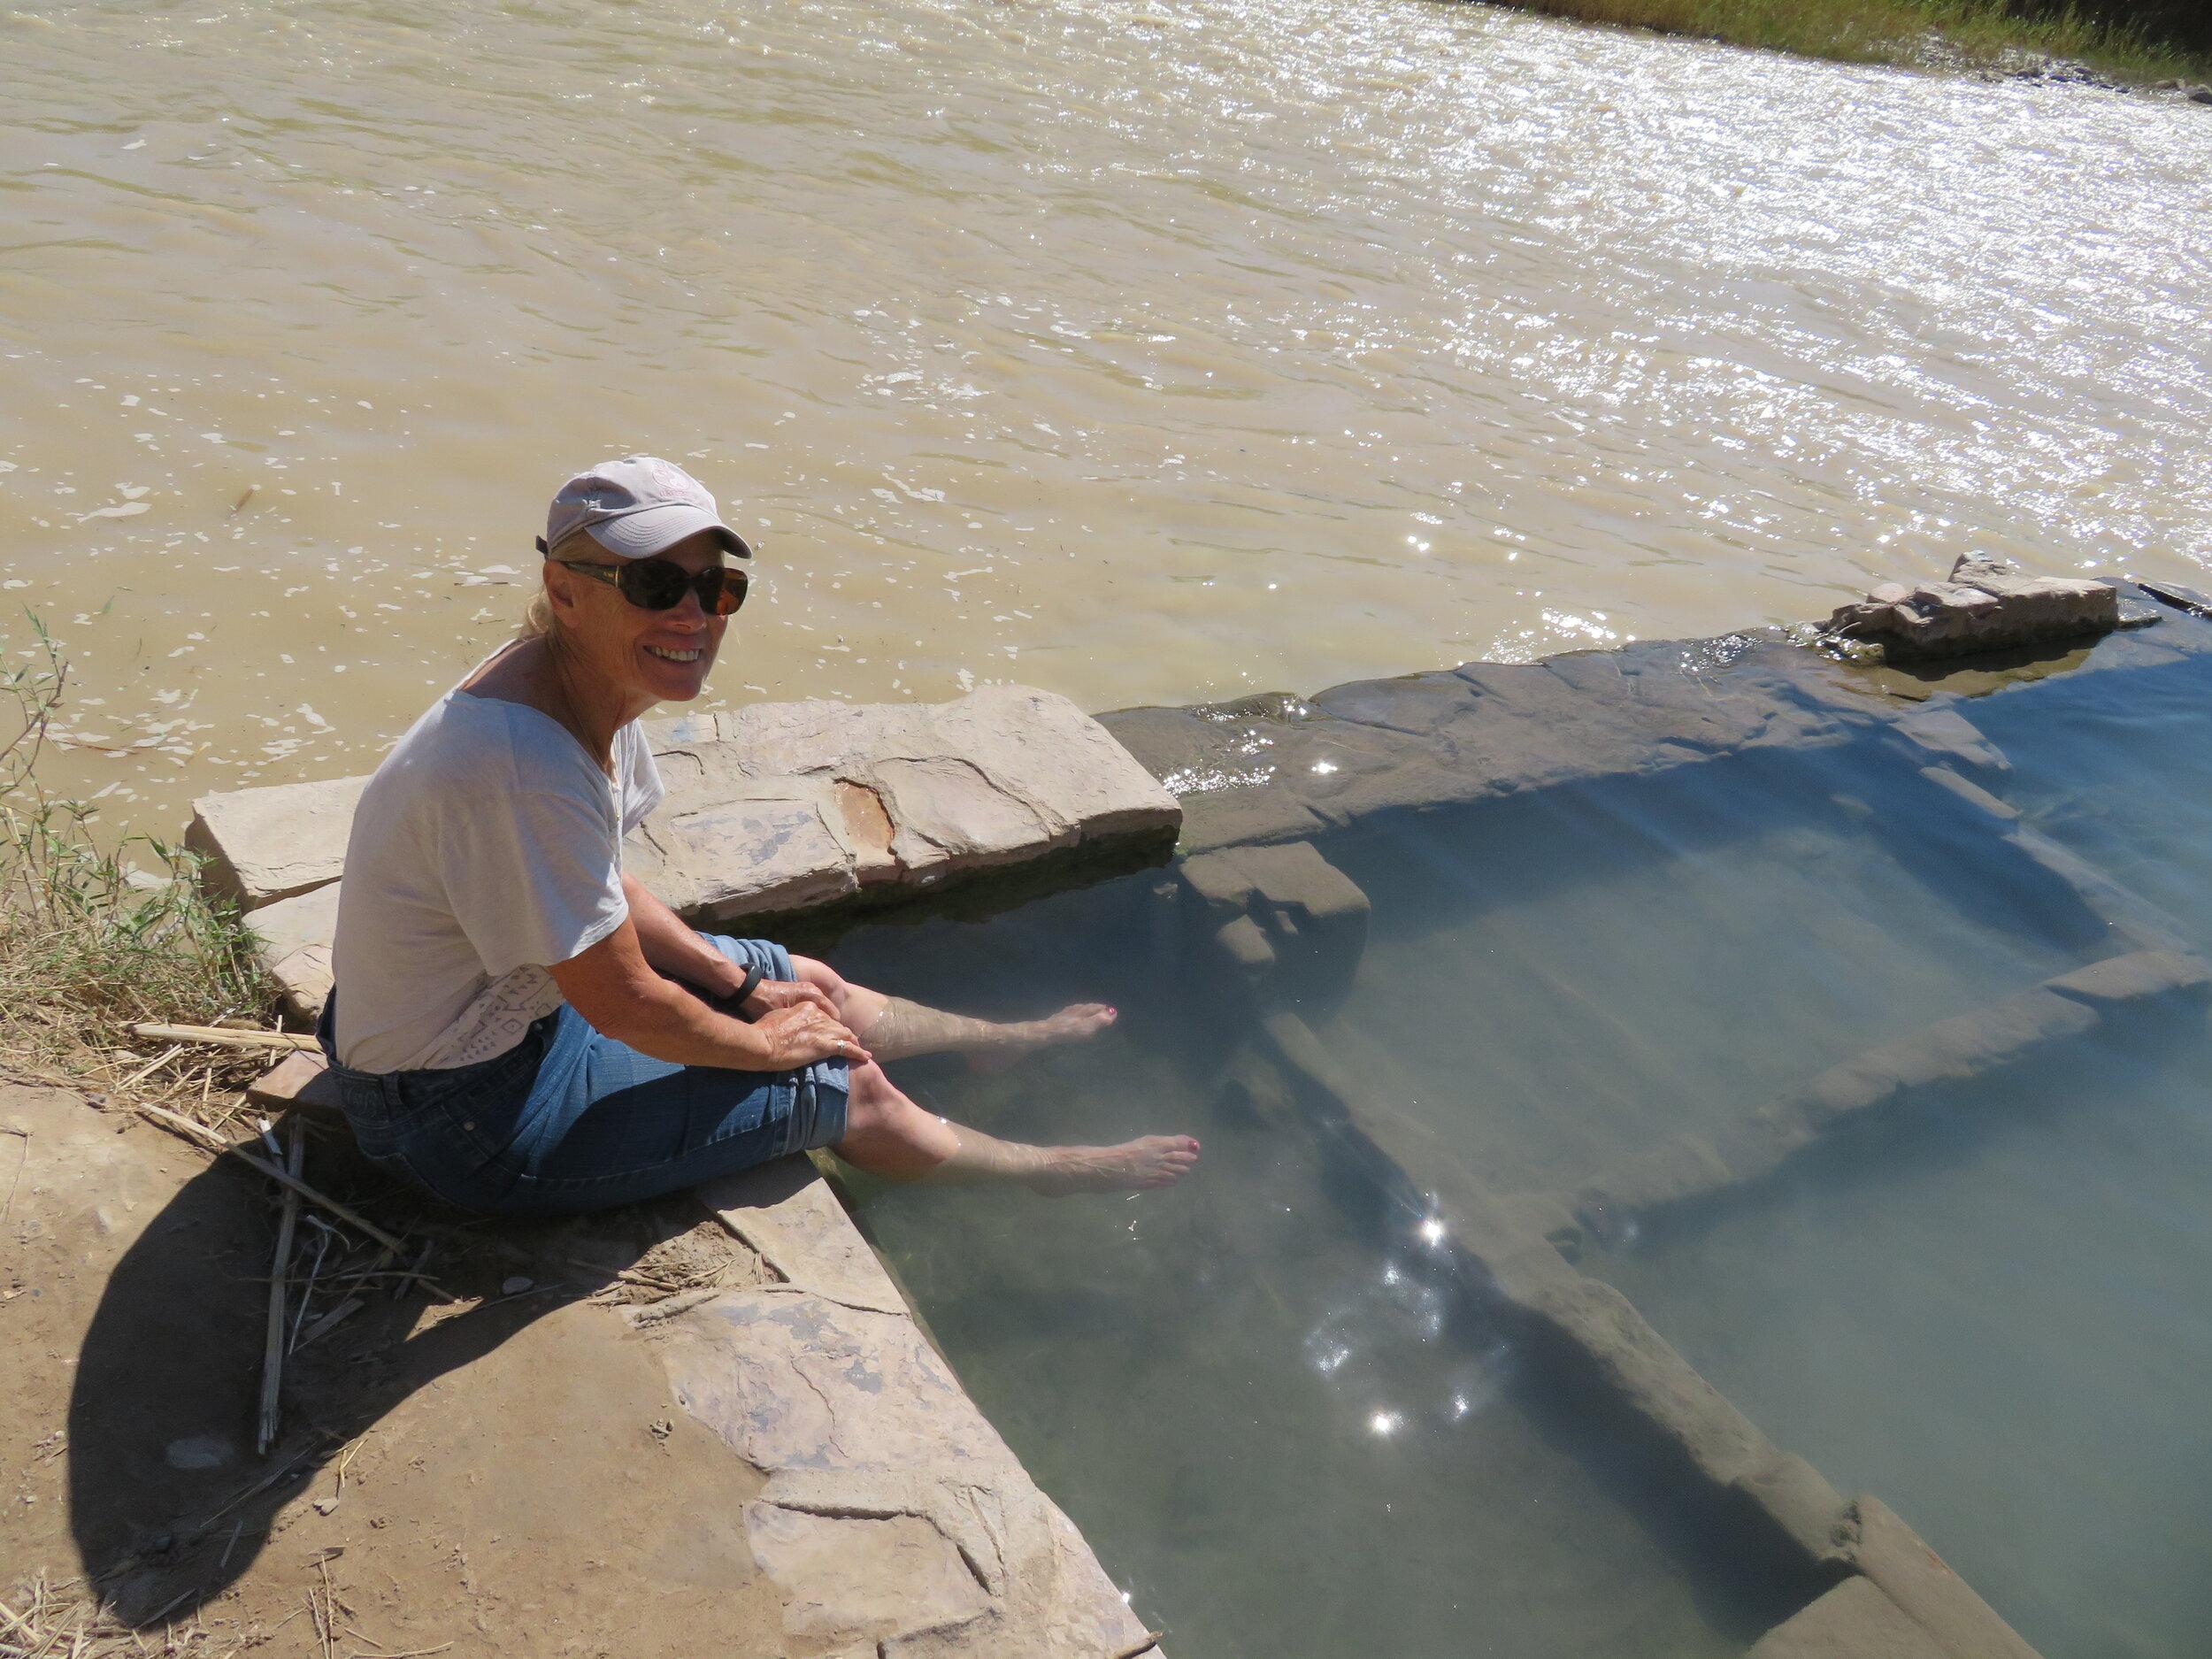 Hot springs, cold Rio Grande